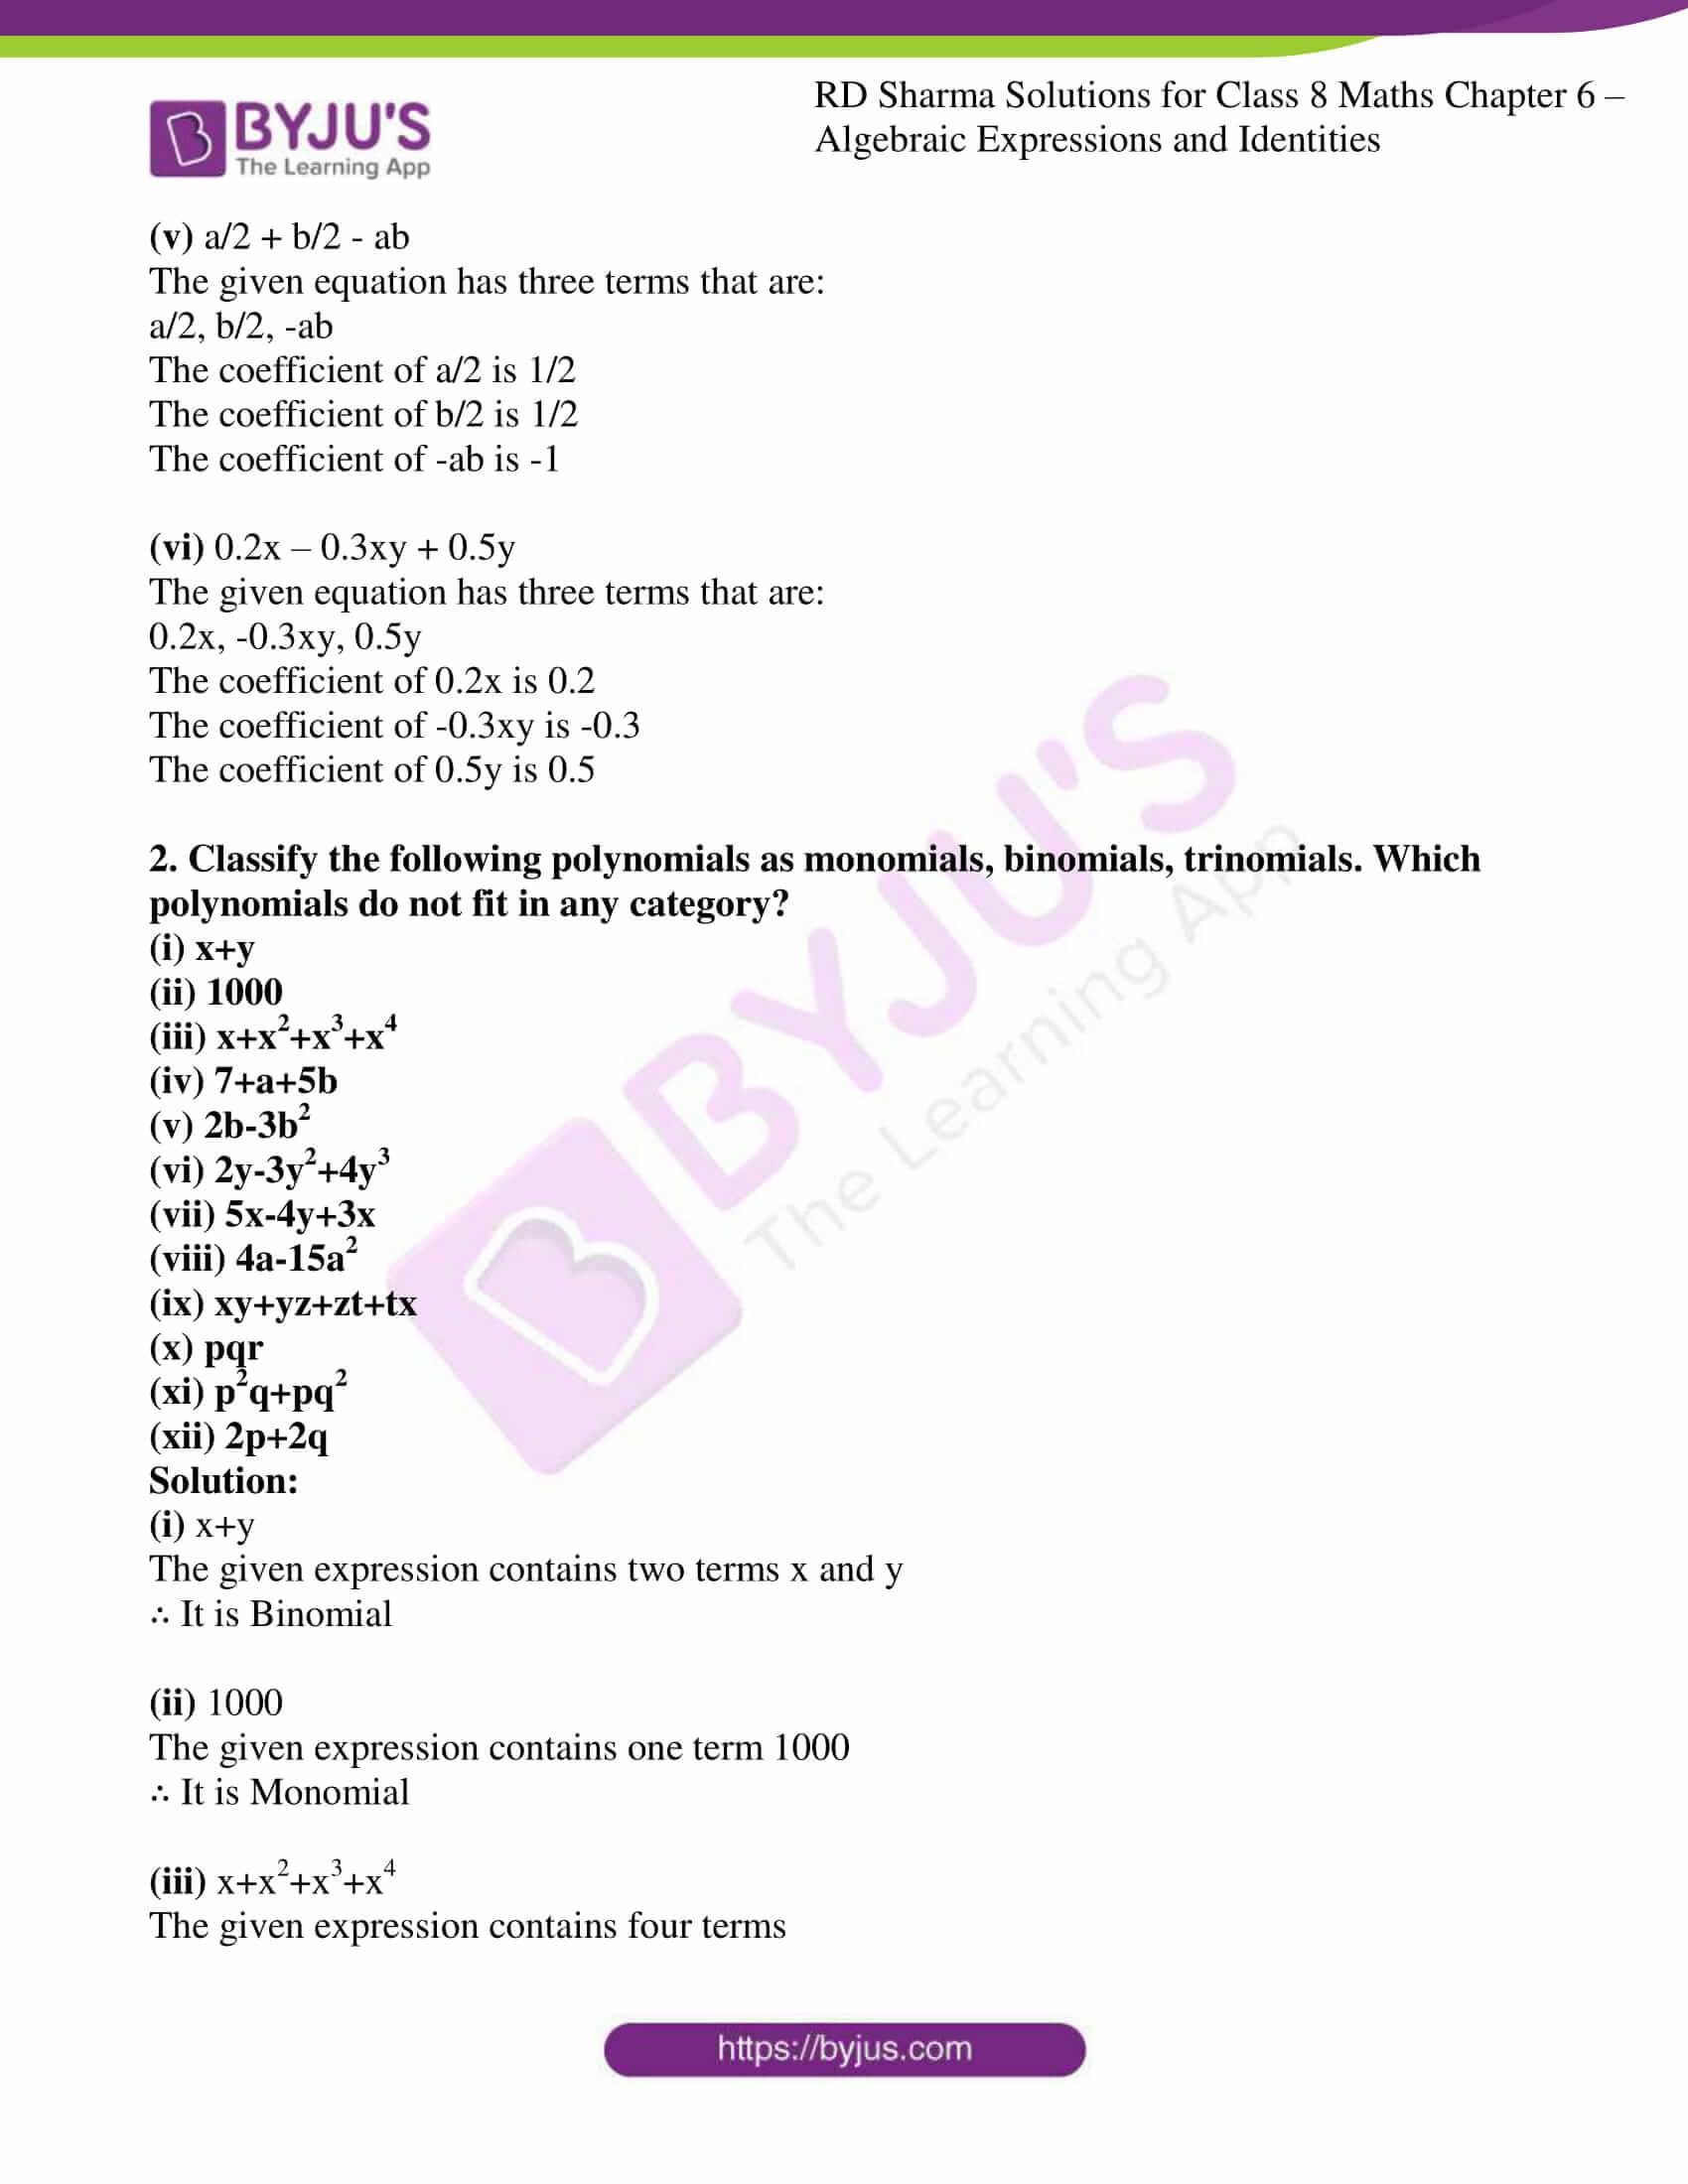 rd sharma class 8 maths chapter 6 exercise 1 2